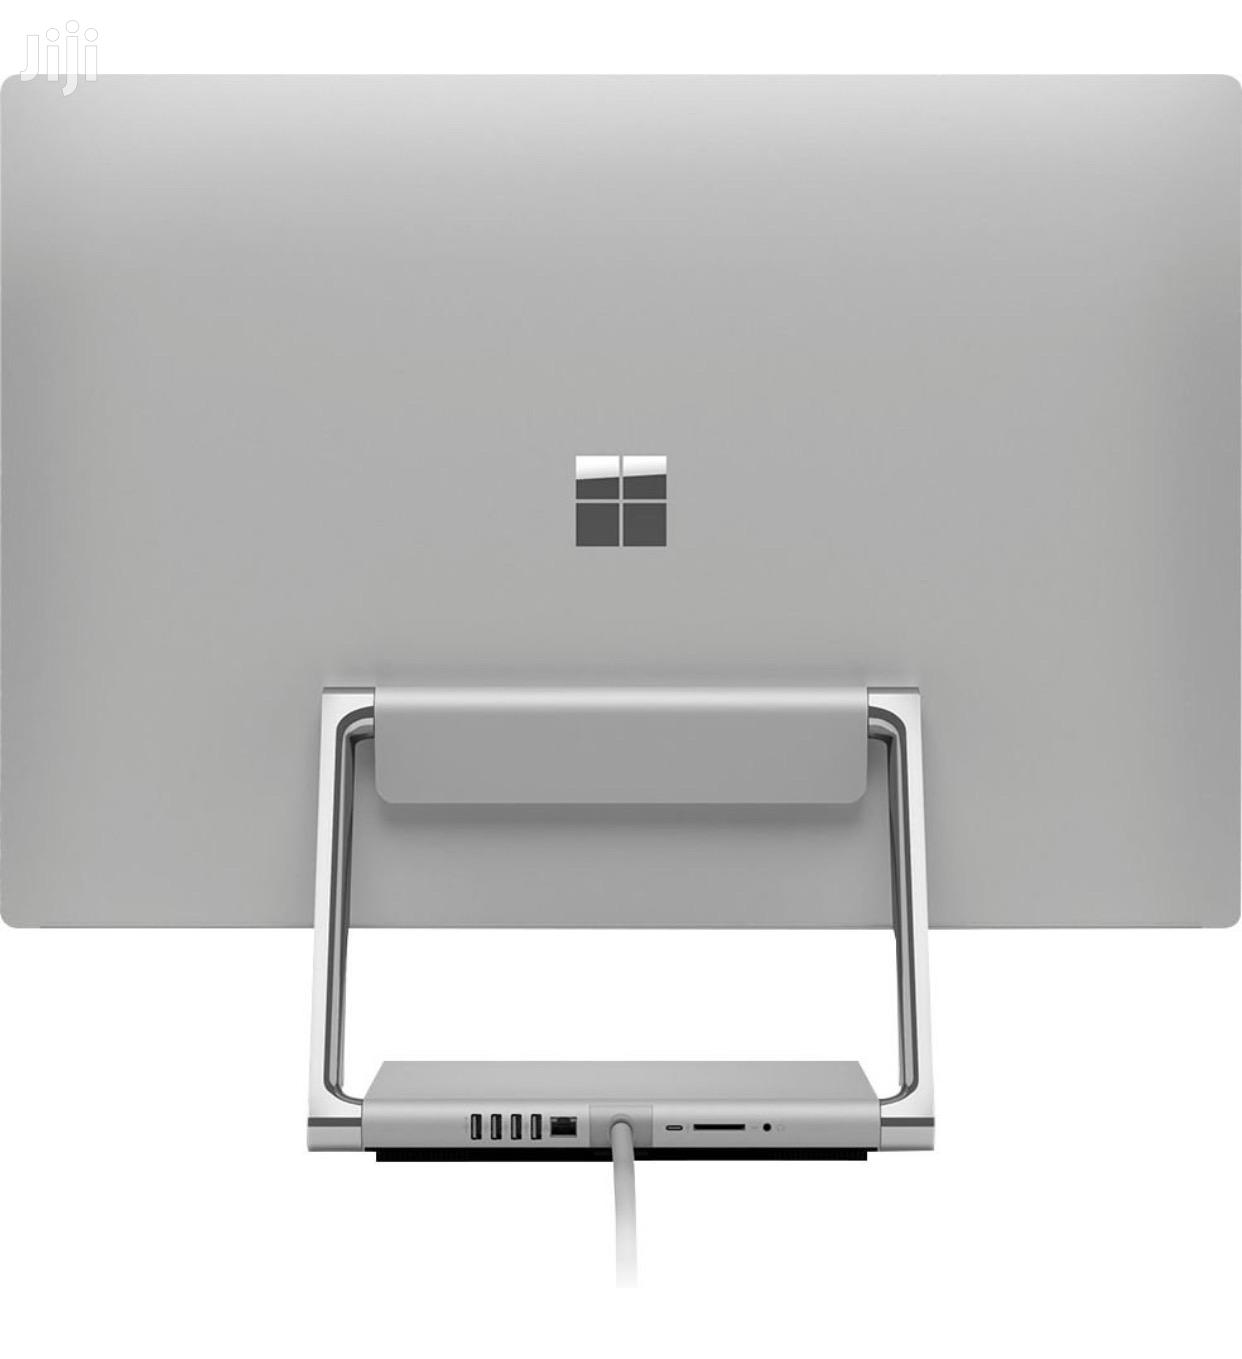 New Desktop Computer Laptop 16GB Intel Core i7 SSD 1T | Laptops & Computers for sale in Accra Metropolitan, Greater Accra, Ghana